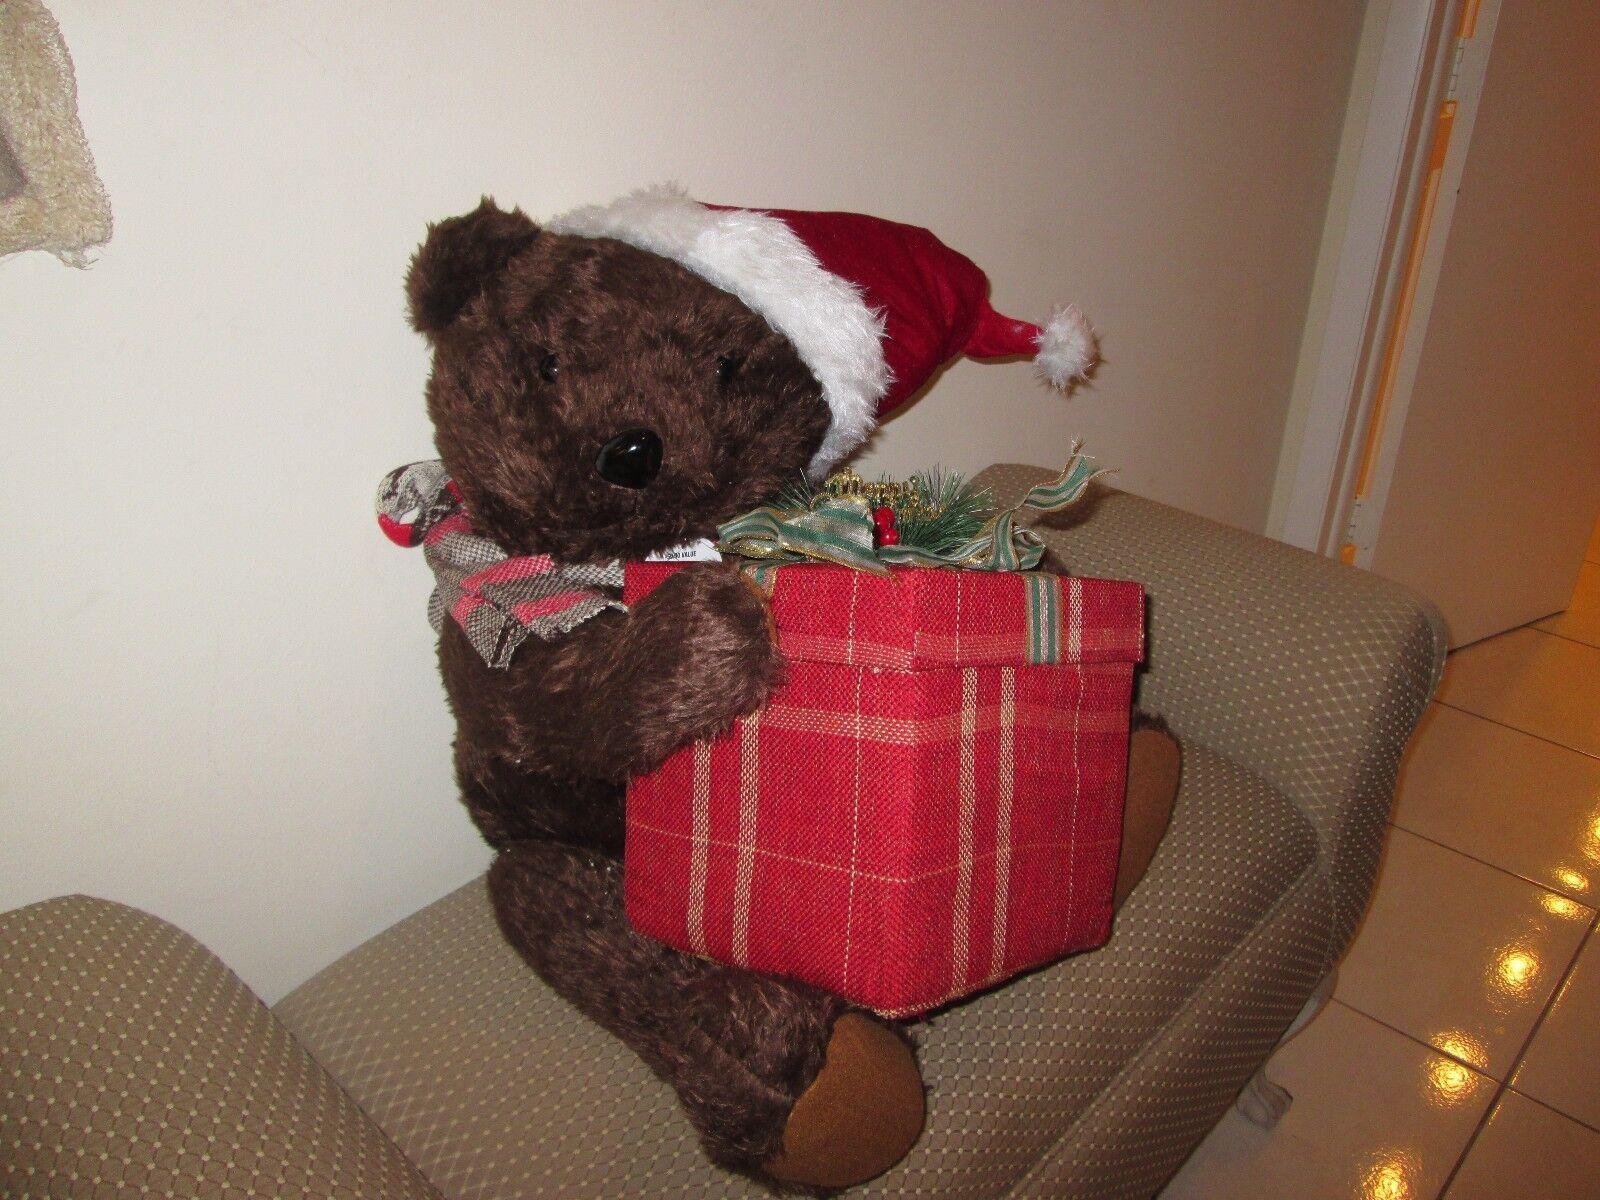 CHRISTMAS STUFFED TEDDY BEAR WITH PRESENT 22  NEW NO TAGS